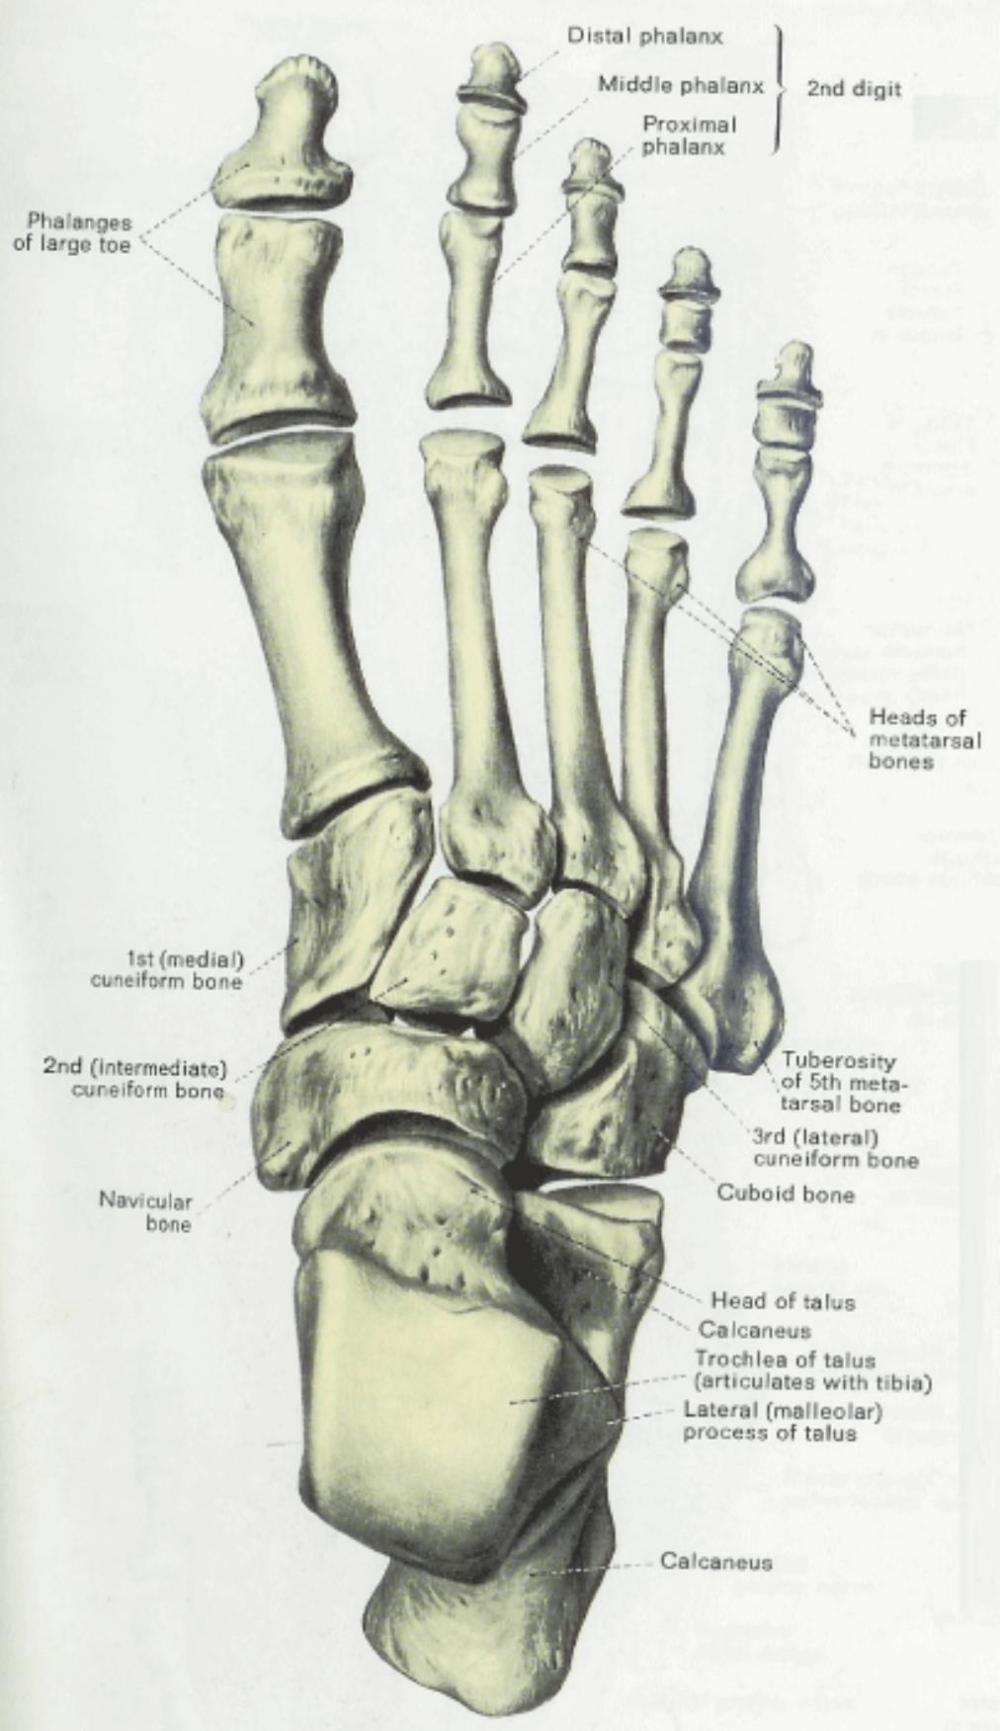 medium resolution of 1012x1752 anatomy amp physiology illustration egeszseg megorzo